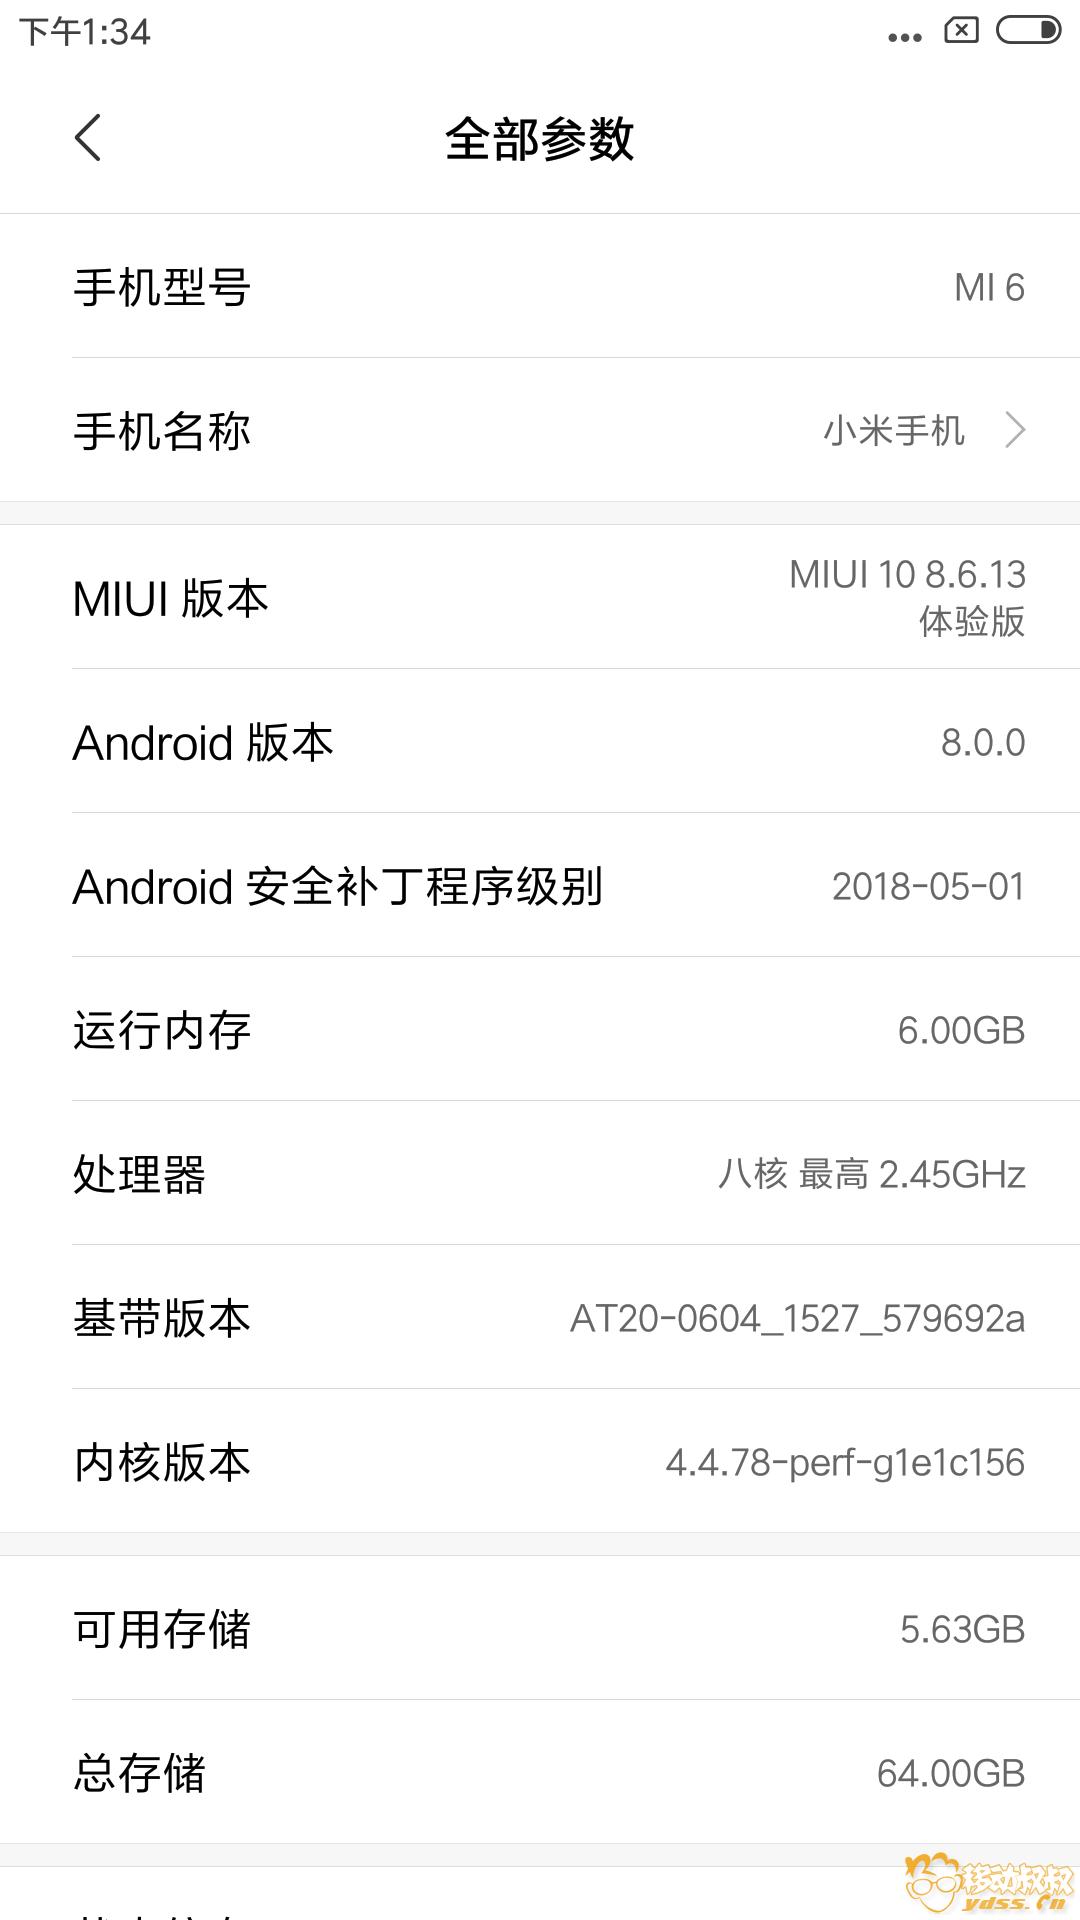 Screenshot_2018-06-14-13-34-42-358_com.android.settings.png